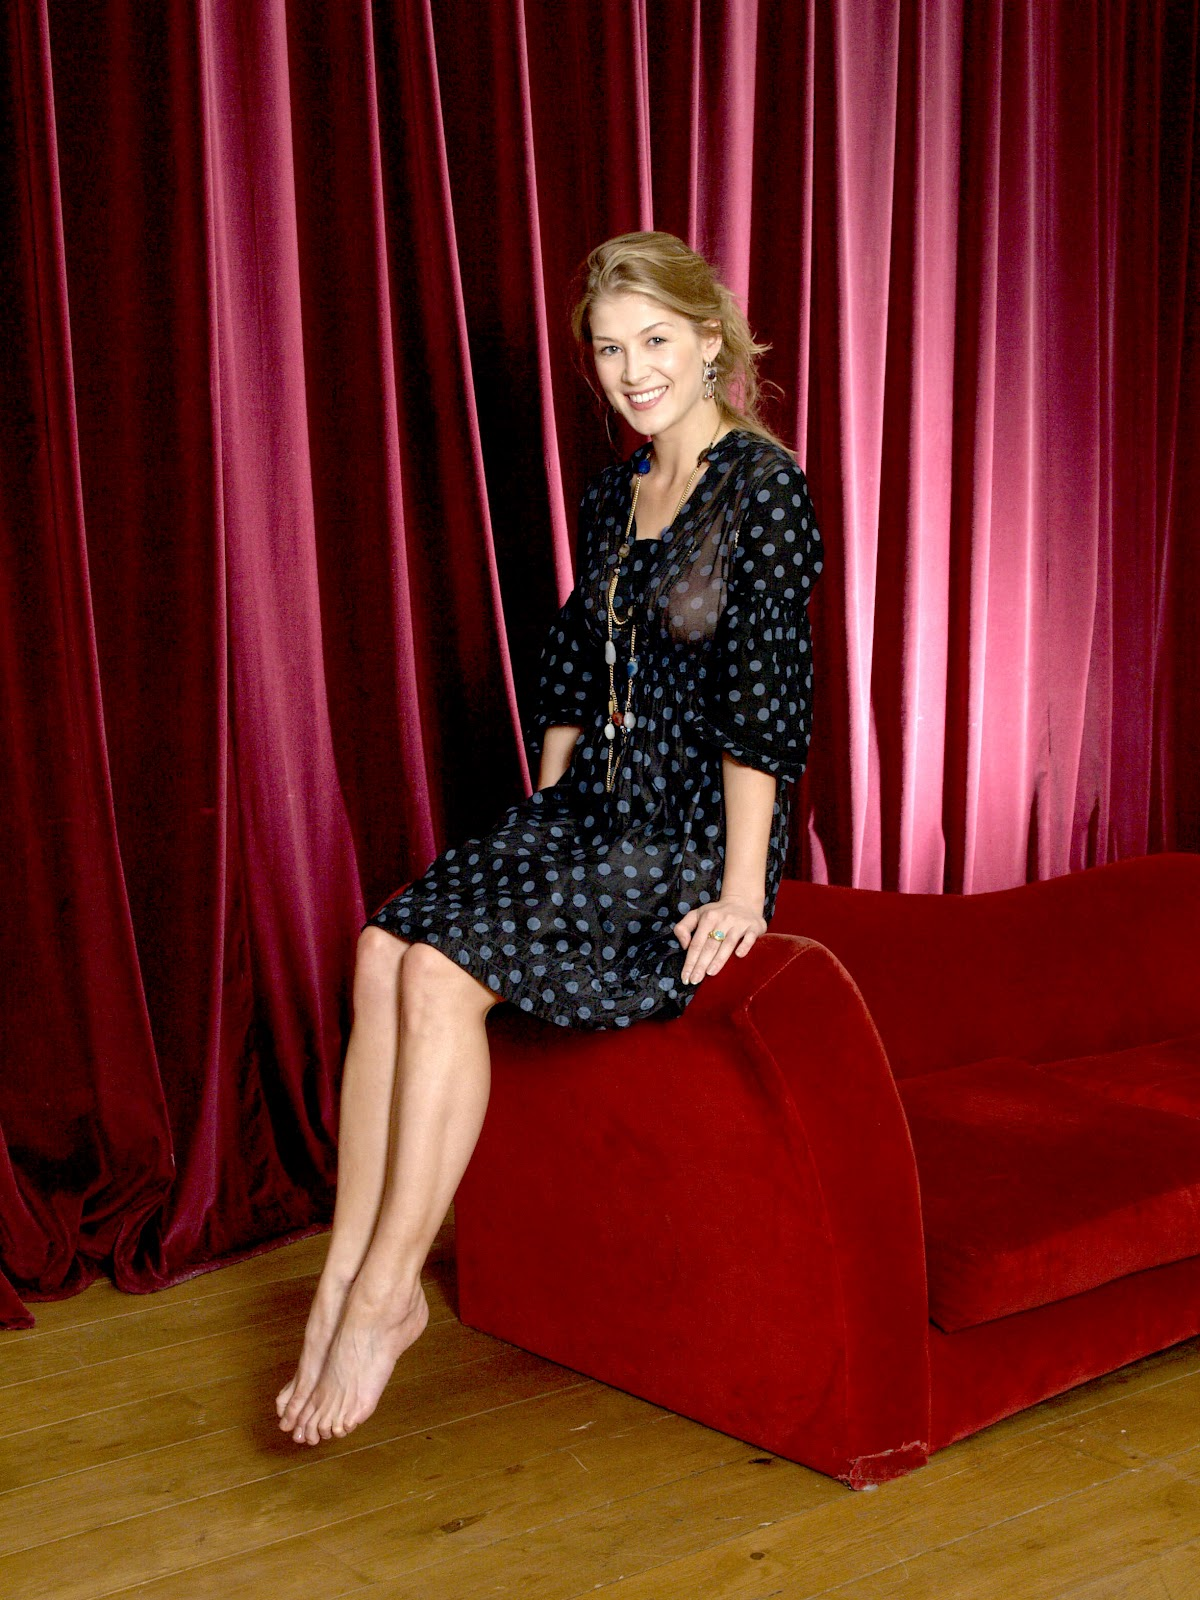 Rosamund Pike pictures gallery (5) | Film Actresses Abbie Cornish Facebook